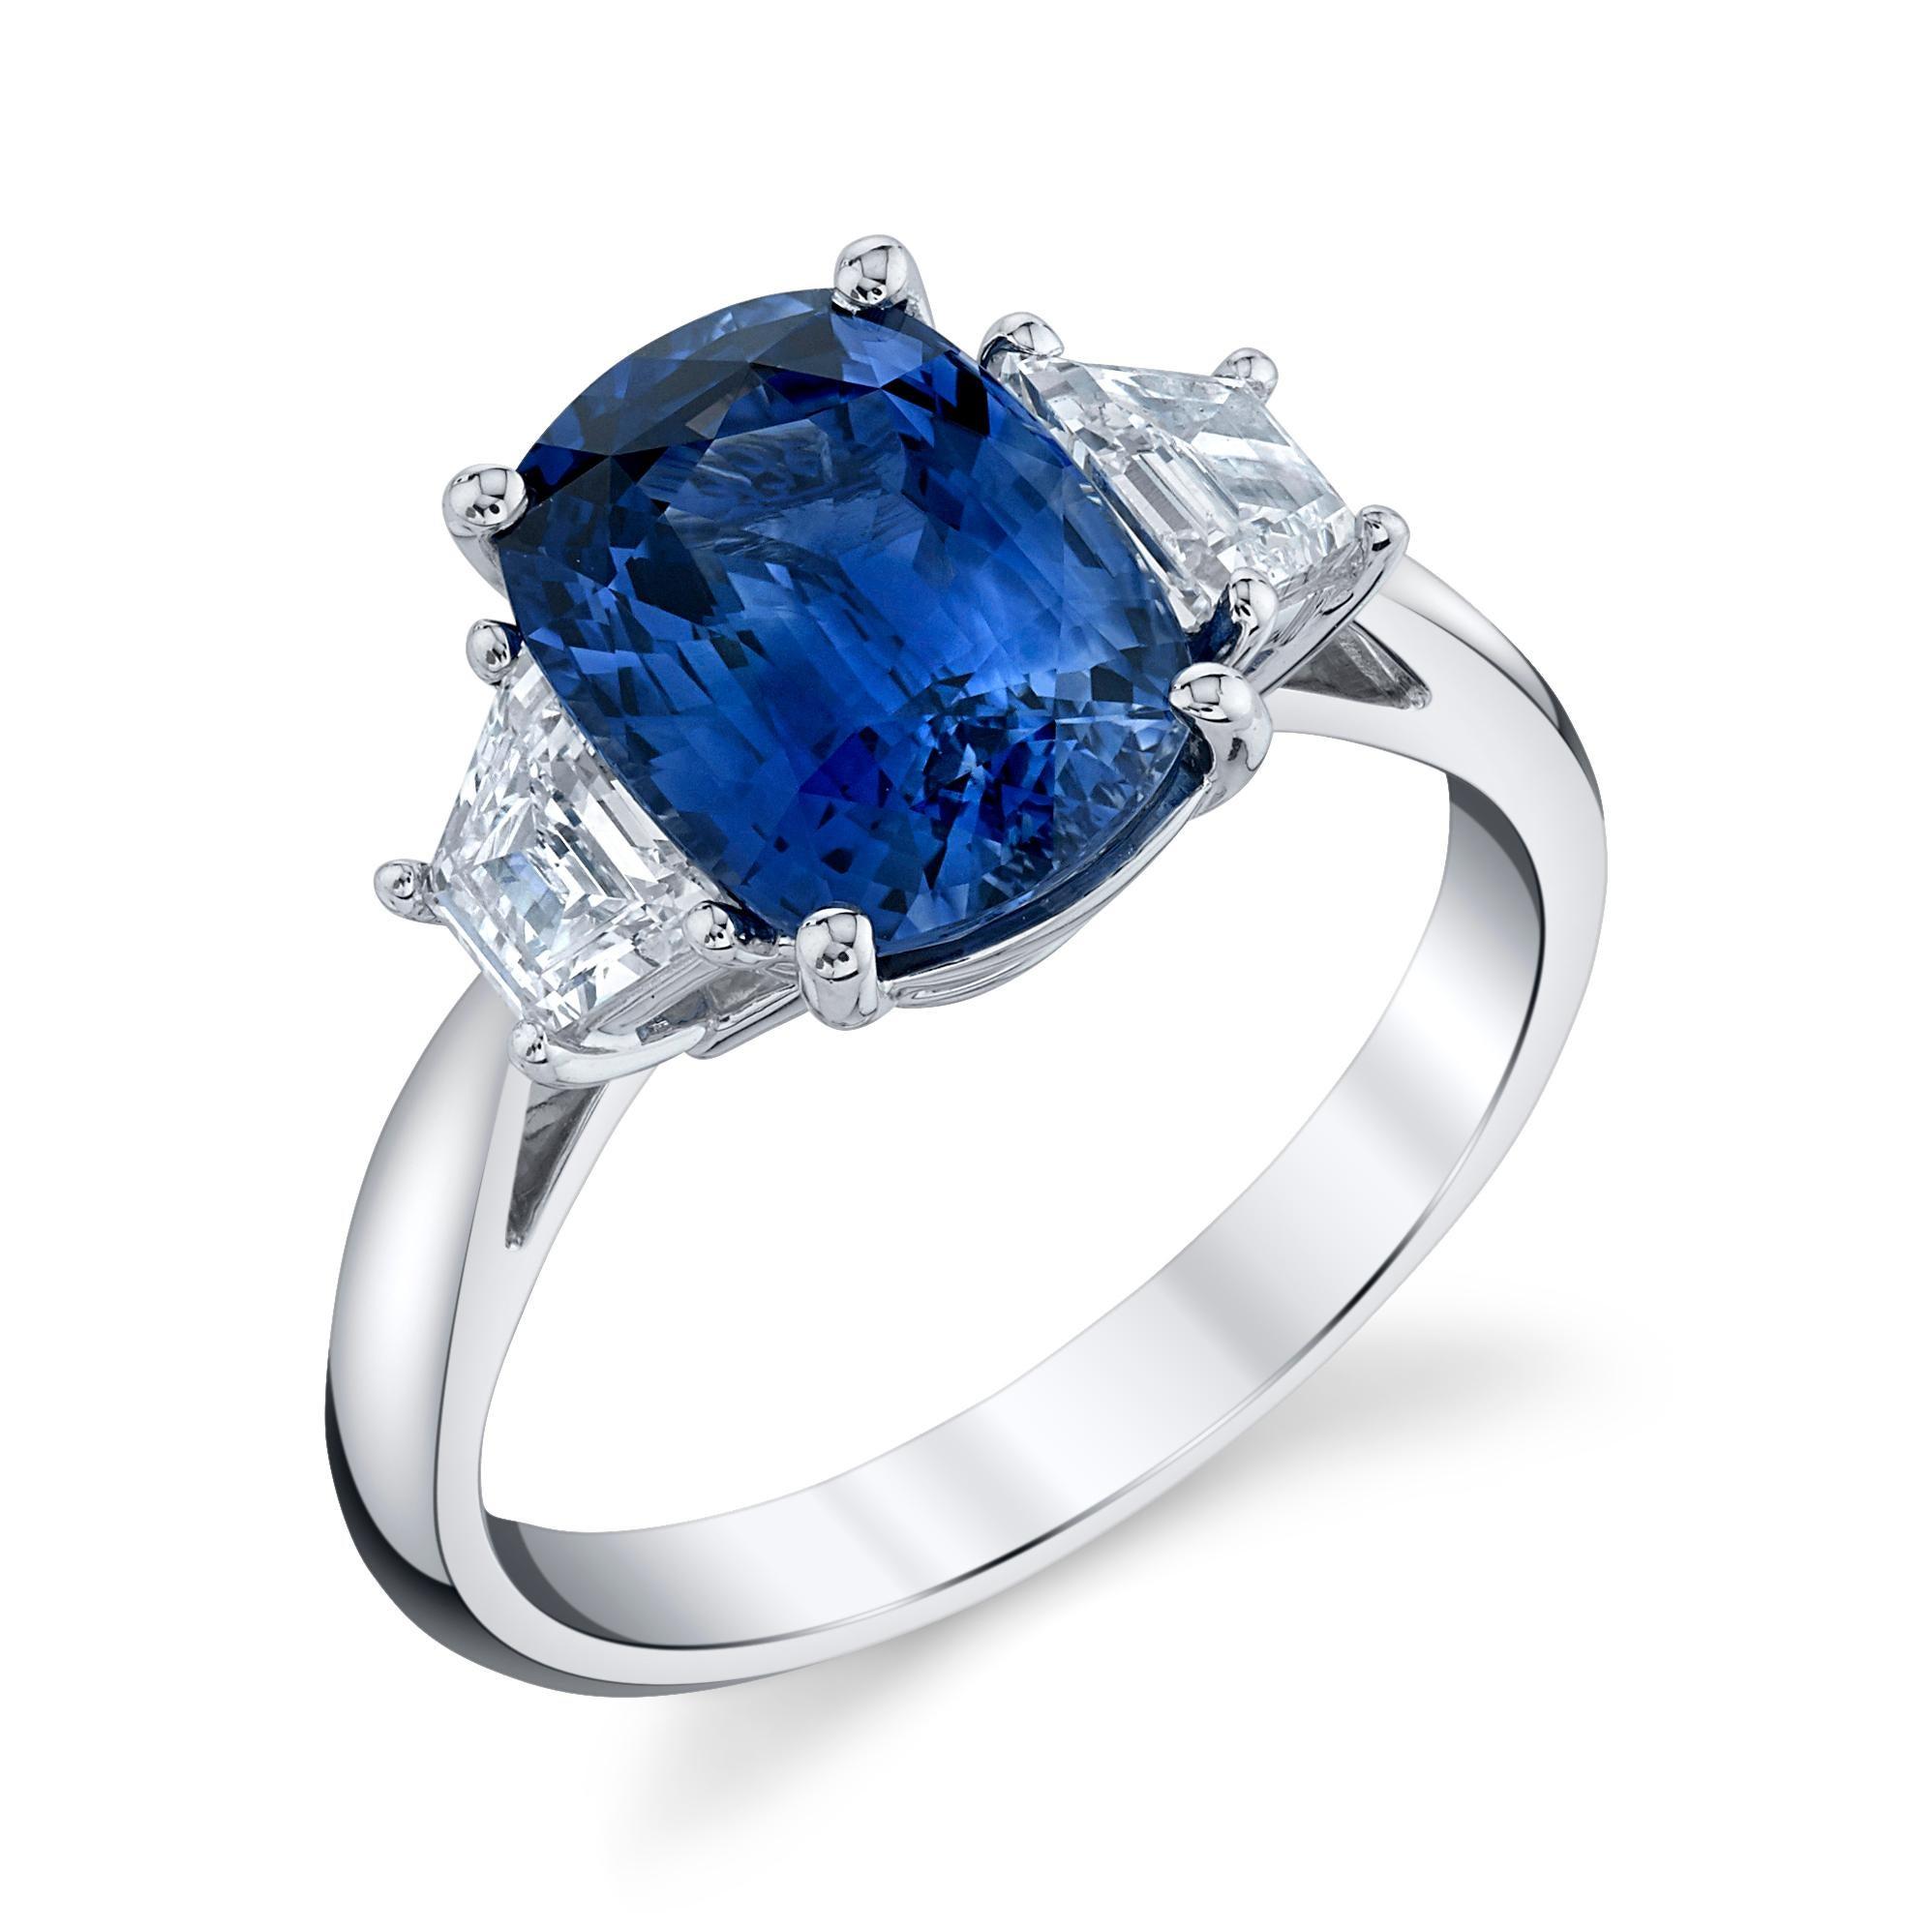 3.56 ct. Blue Sapphire Cushion GIA, Diamond, Platinum 3-Stone Engagement Ring